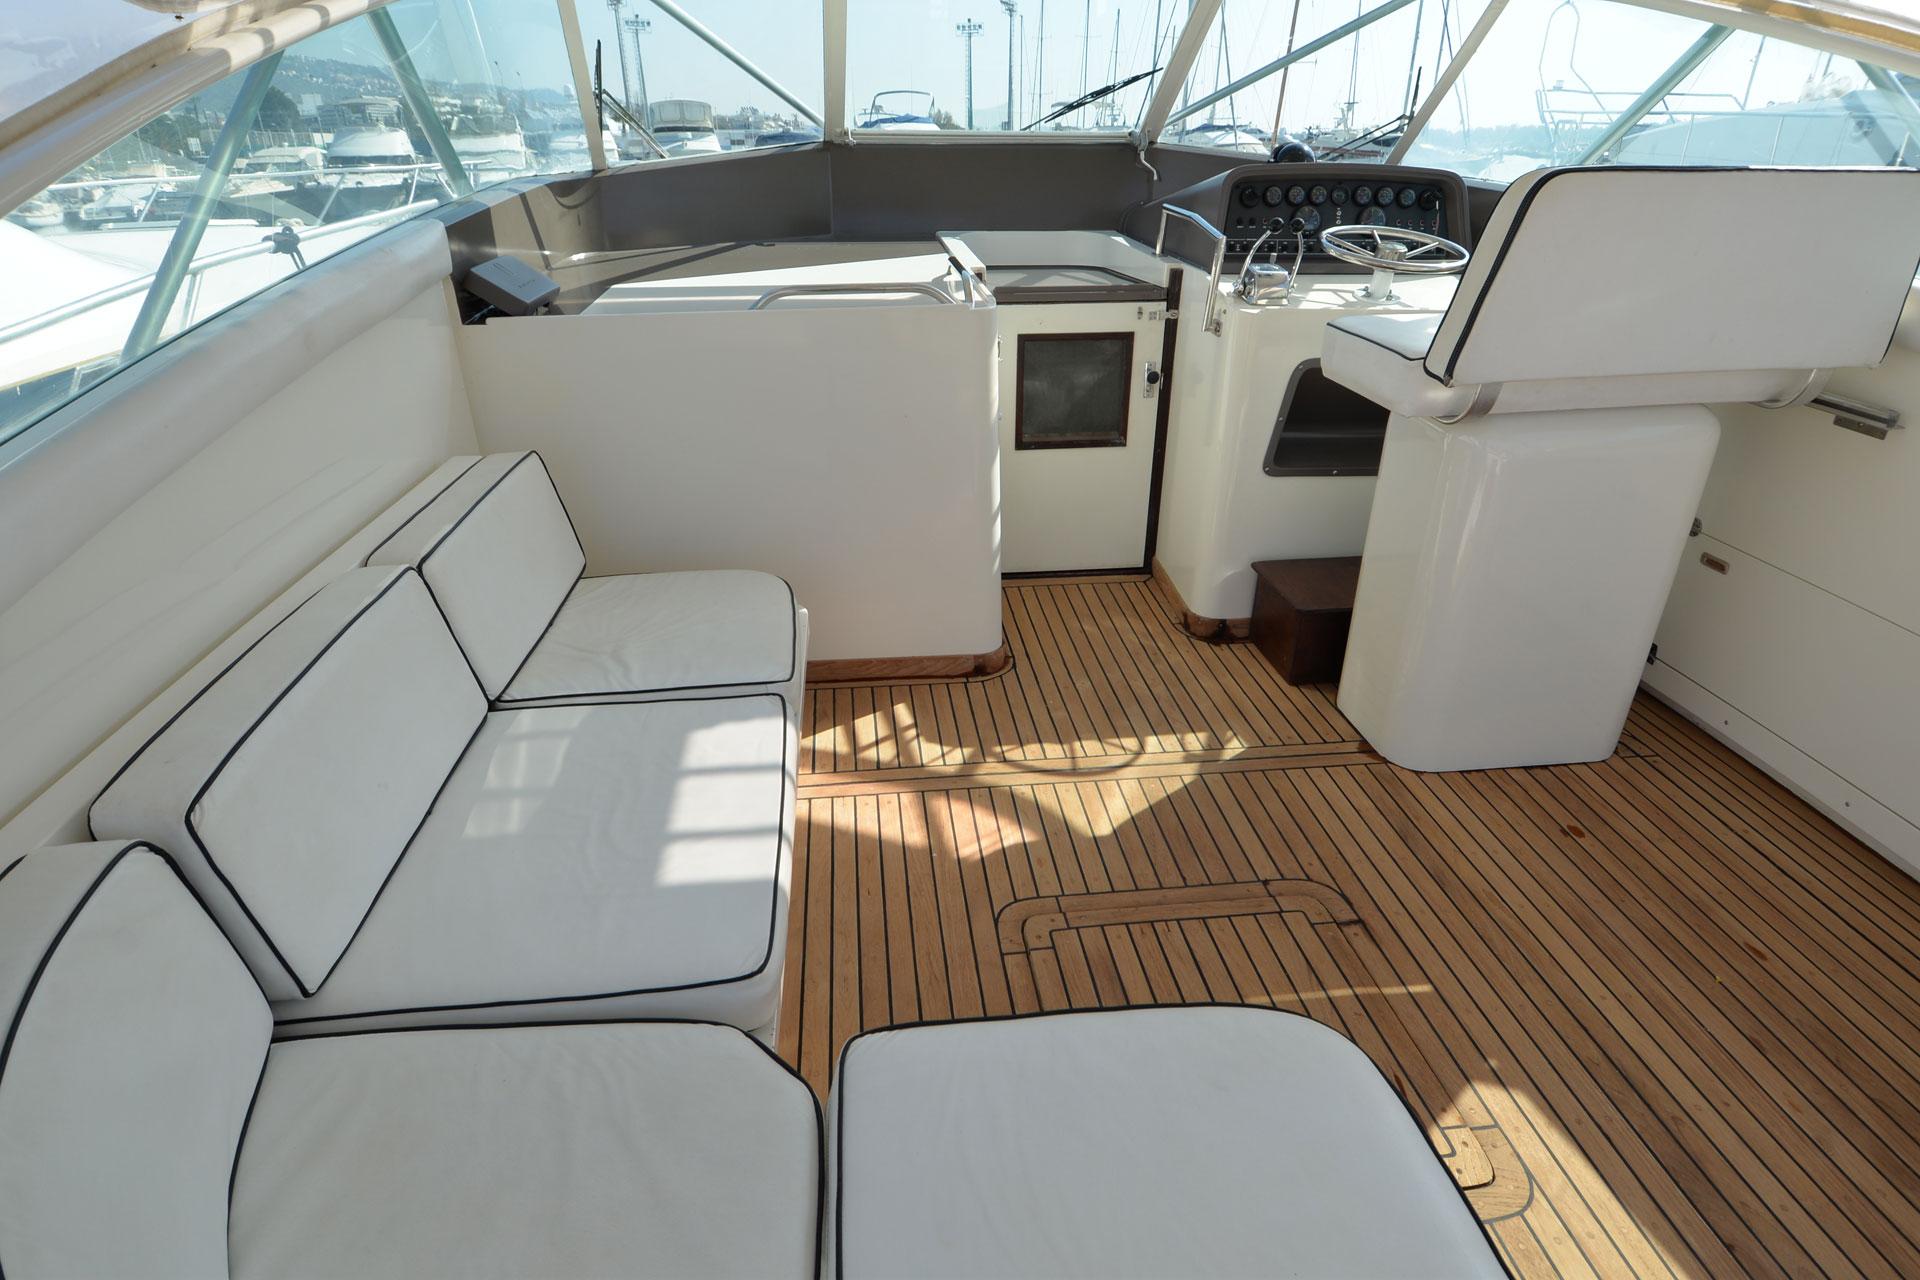 Santo-Maritime-Yachting-Bertram-Inside-Image5